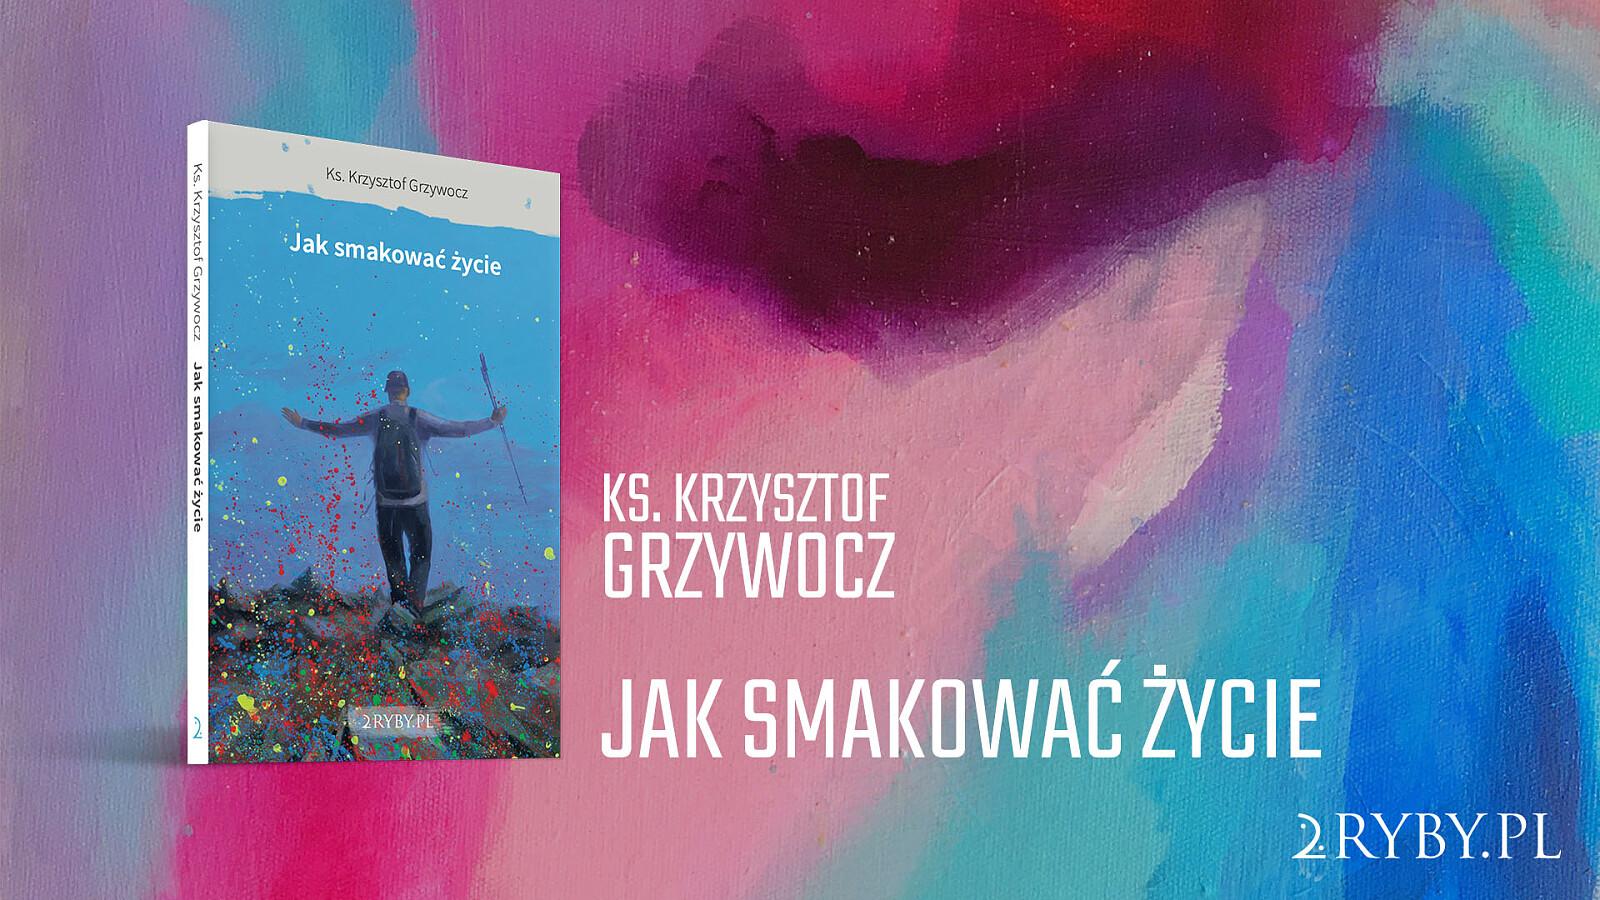 (fot. 2Ryby.pl)